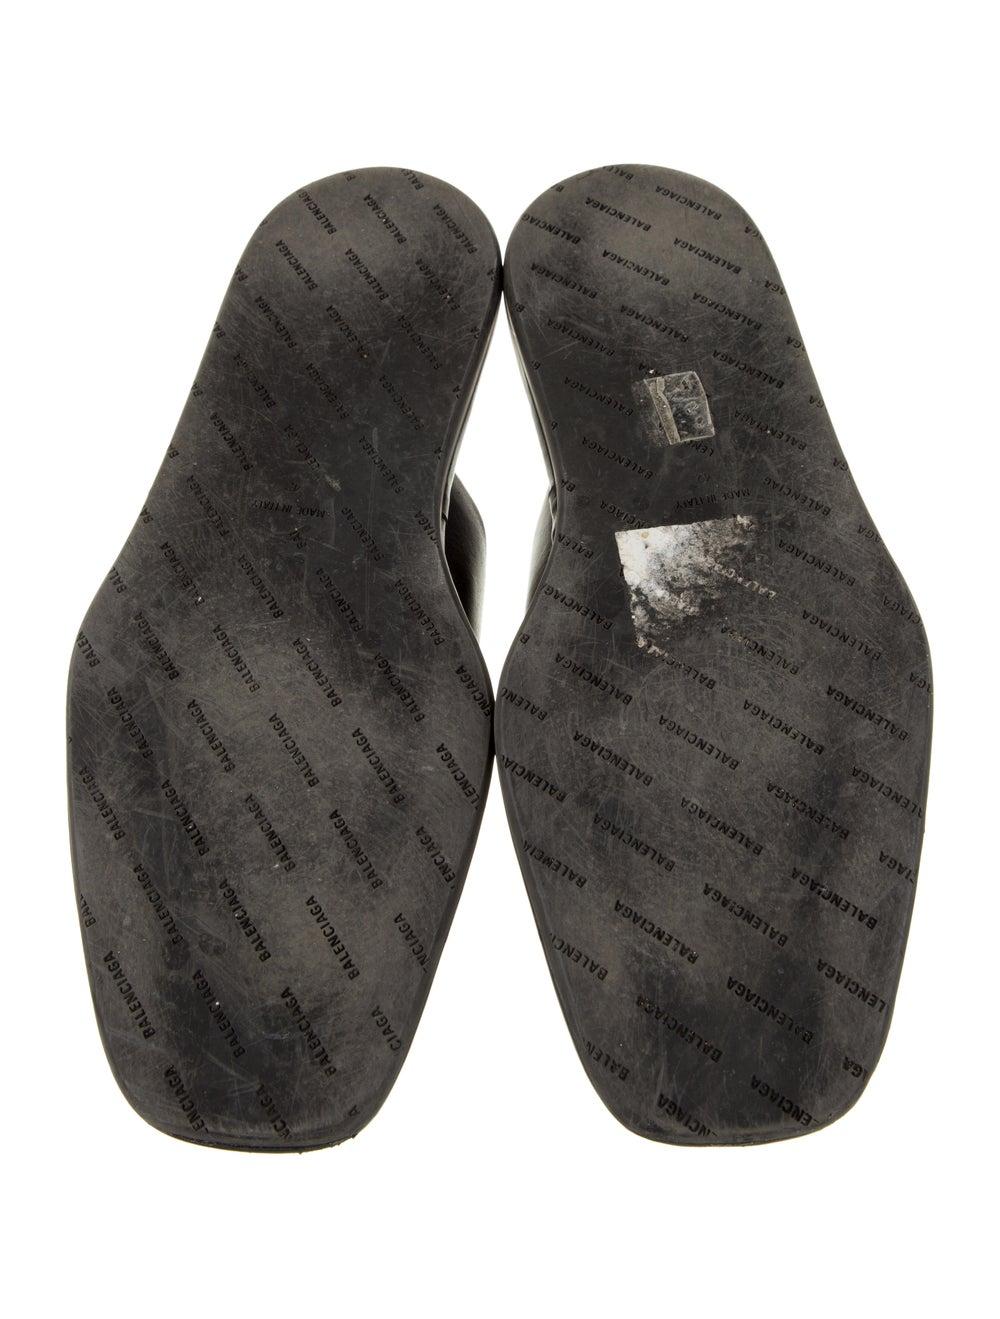 Balenciaga Carrera Mule Leather Slippers Black - image 5